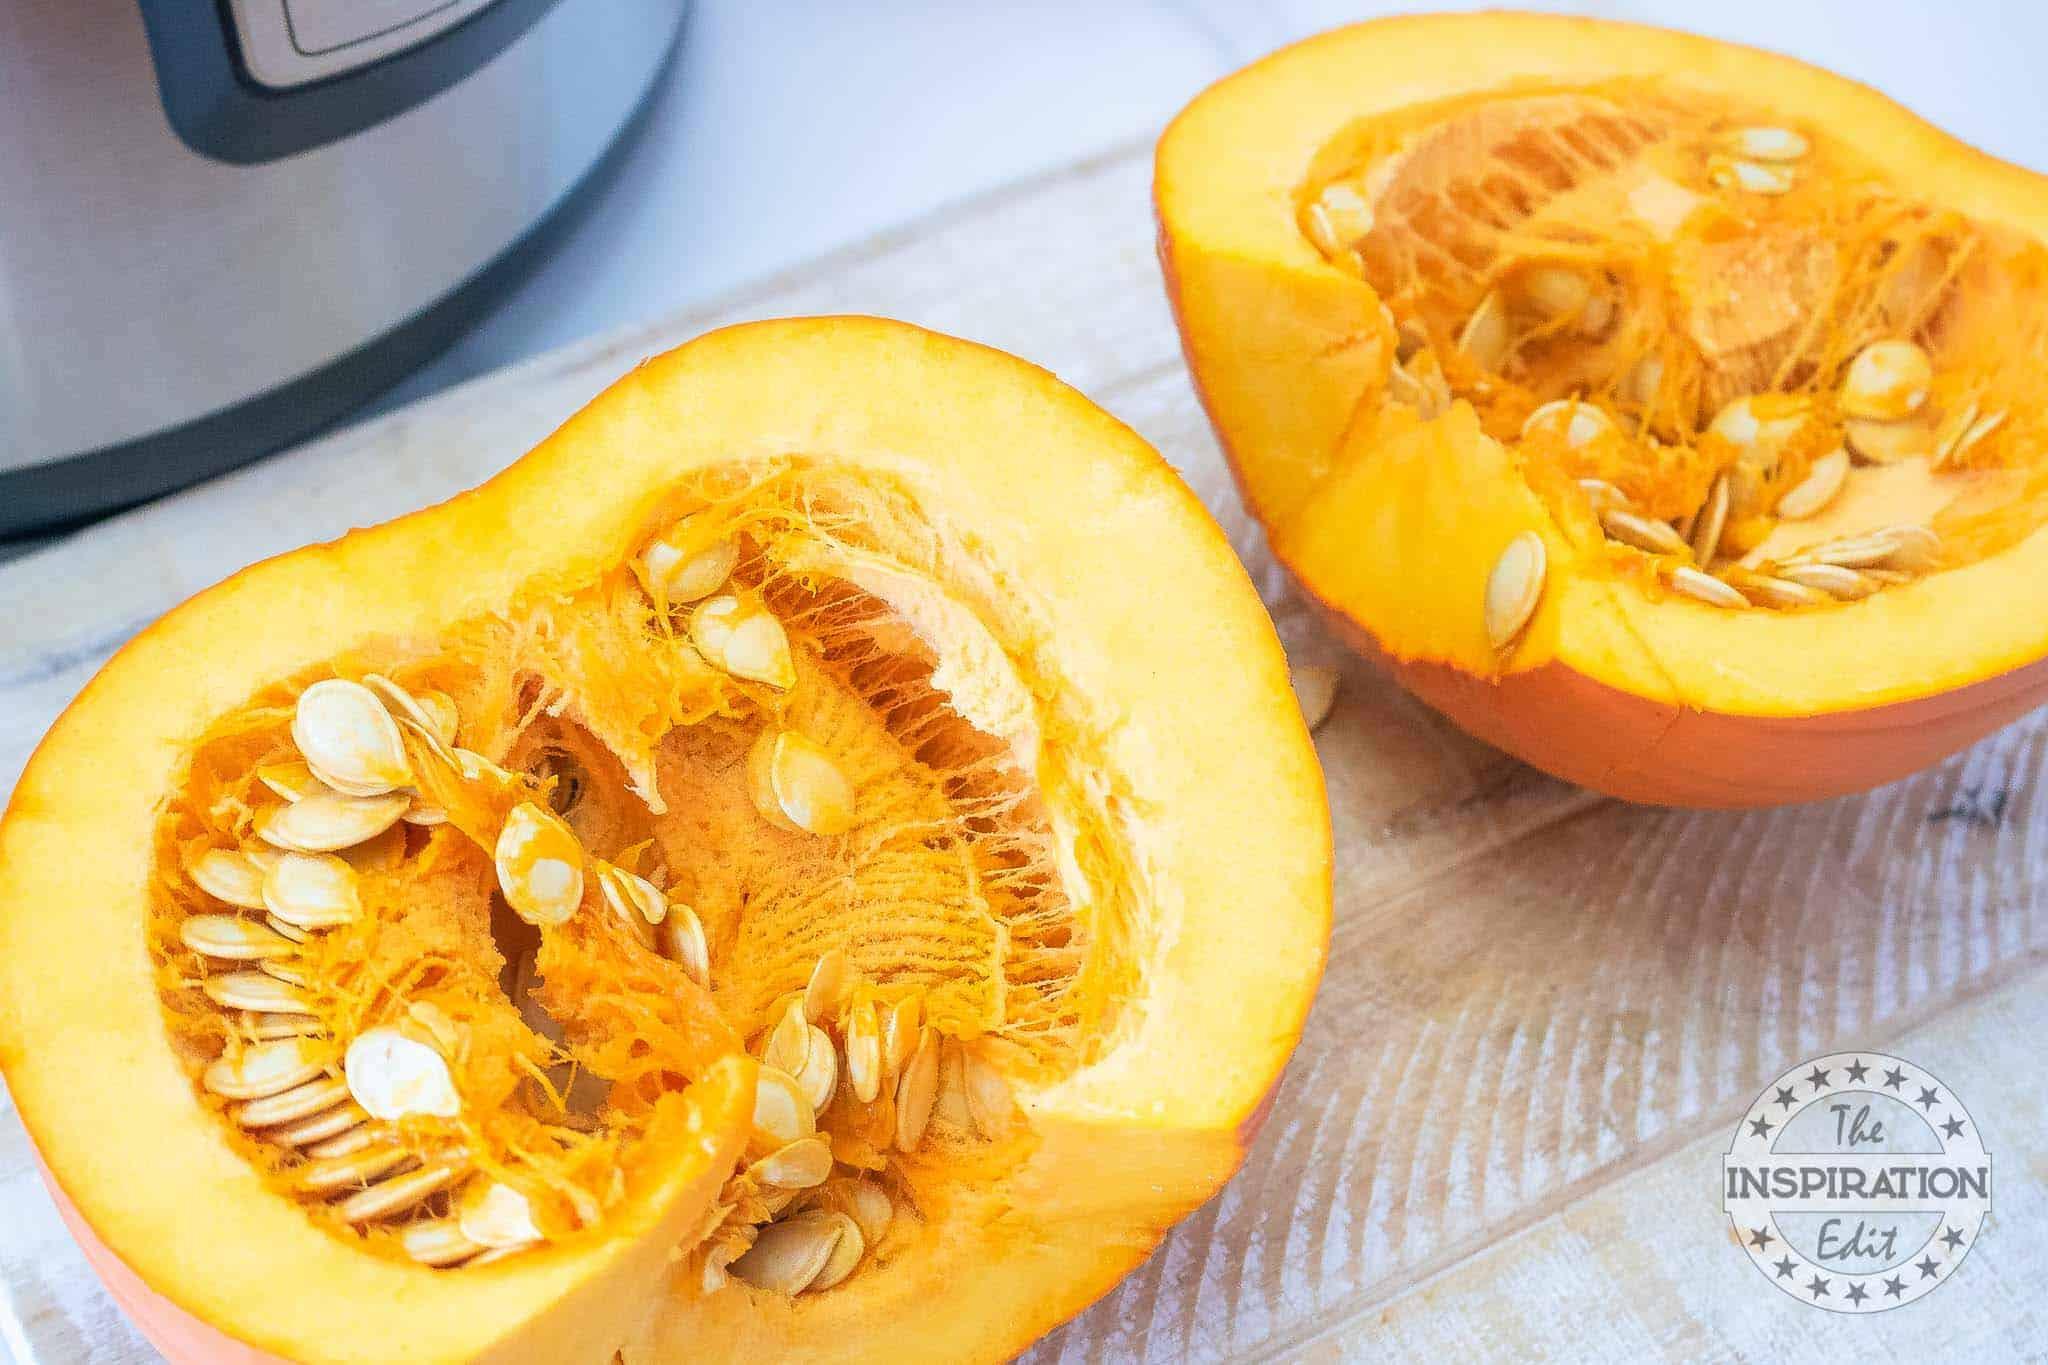 scrape the pumpkin seed to deseed the pumpkin for pumpkin puree recipe